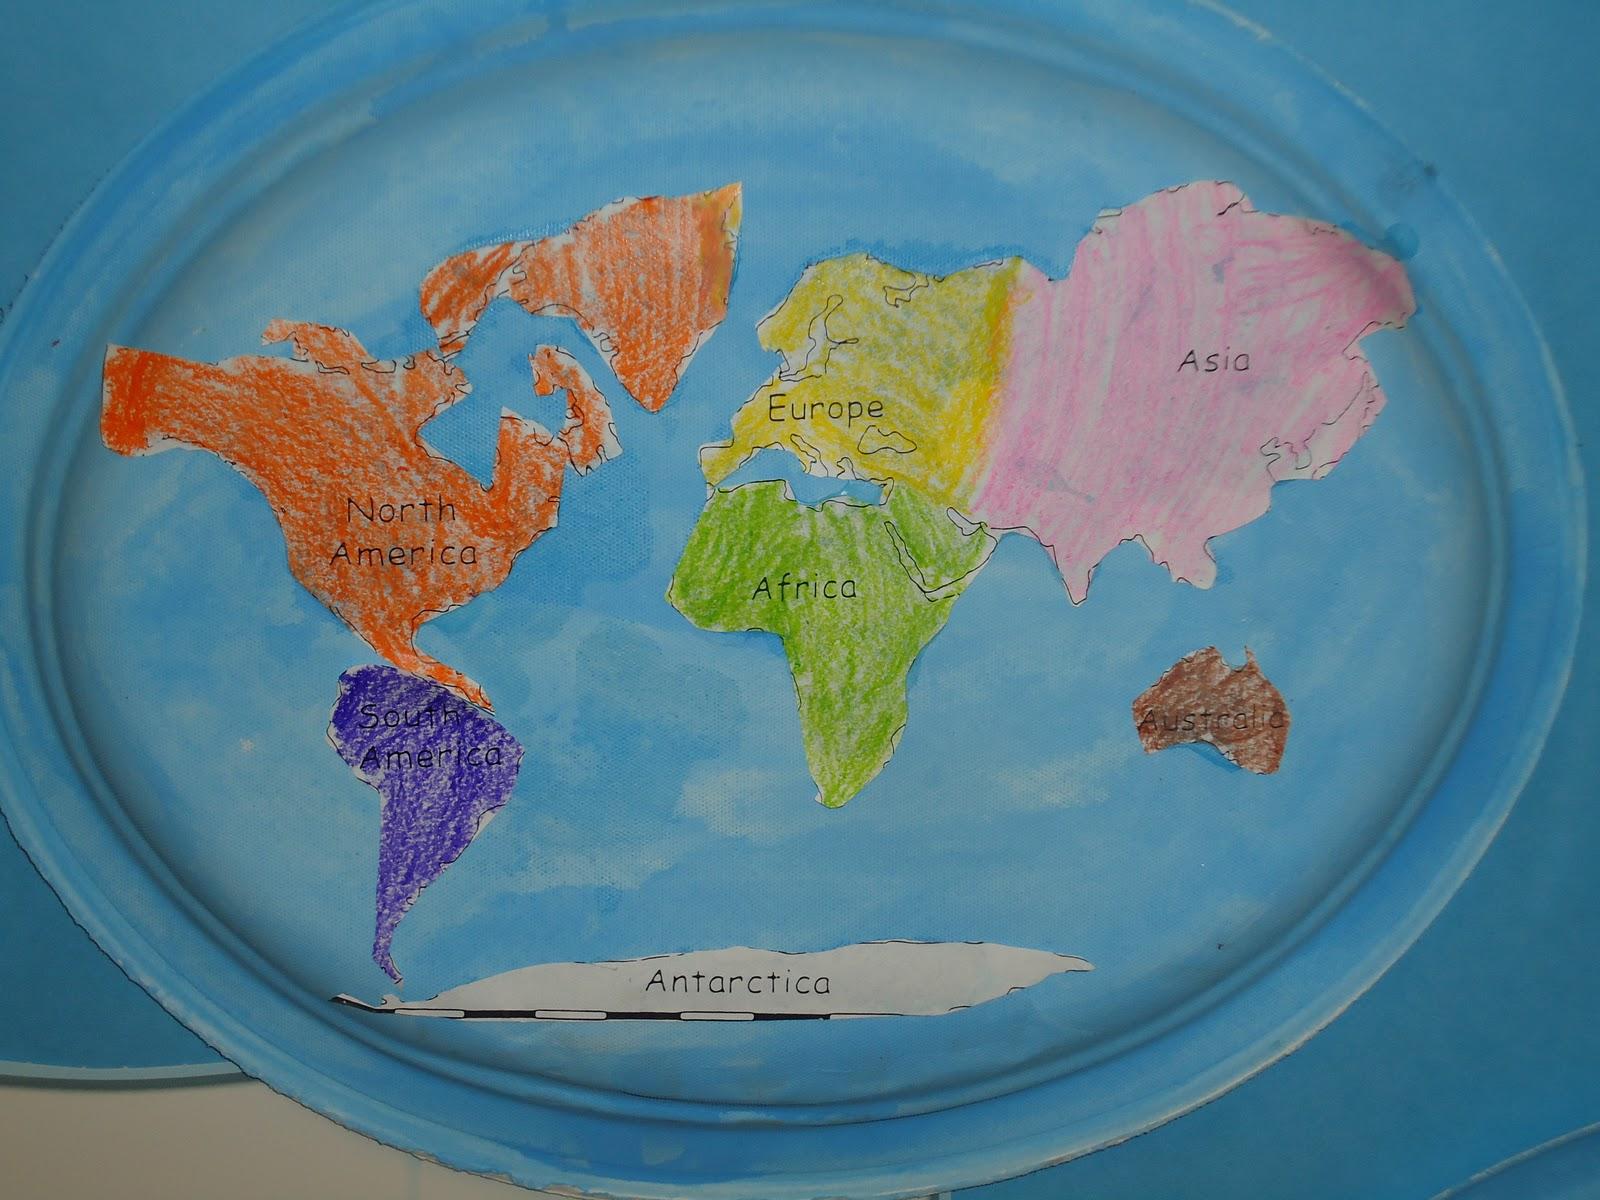 The globe paper